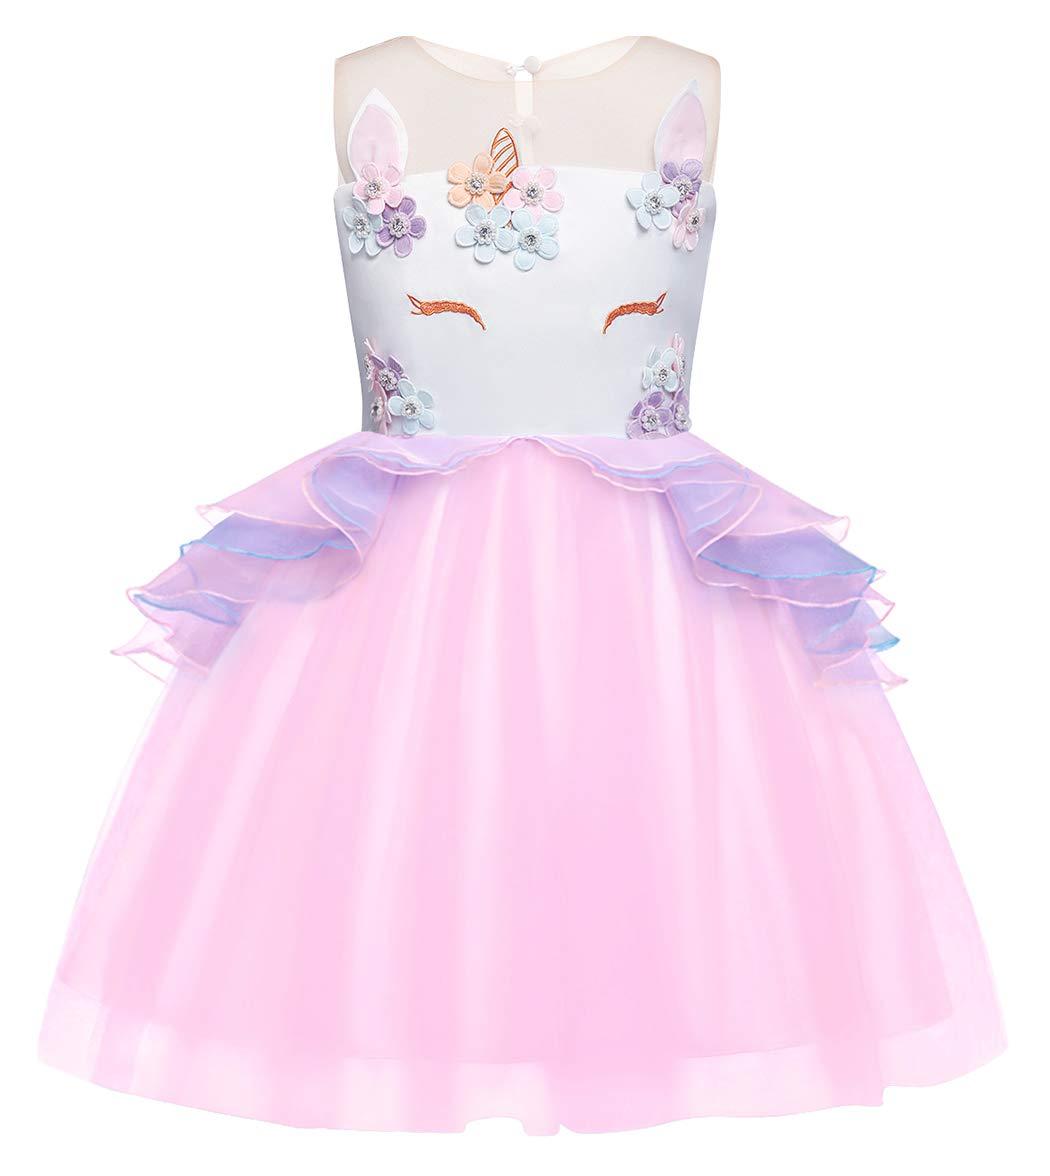 AmzBarley-Girls-Unicorn-Party-Dress-Tulle-Flower-Princess-Dress-Kids-Halloween-Birthday-Evening-Pageant-Fancy-Dress-Up-Outfits